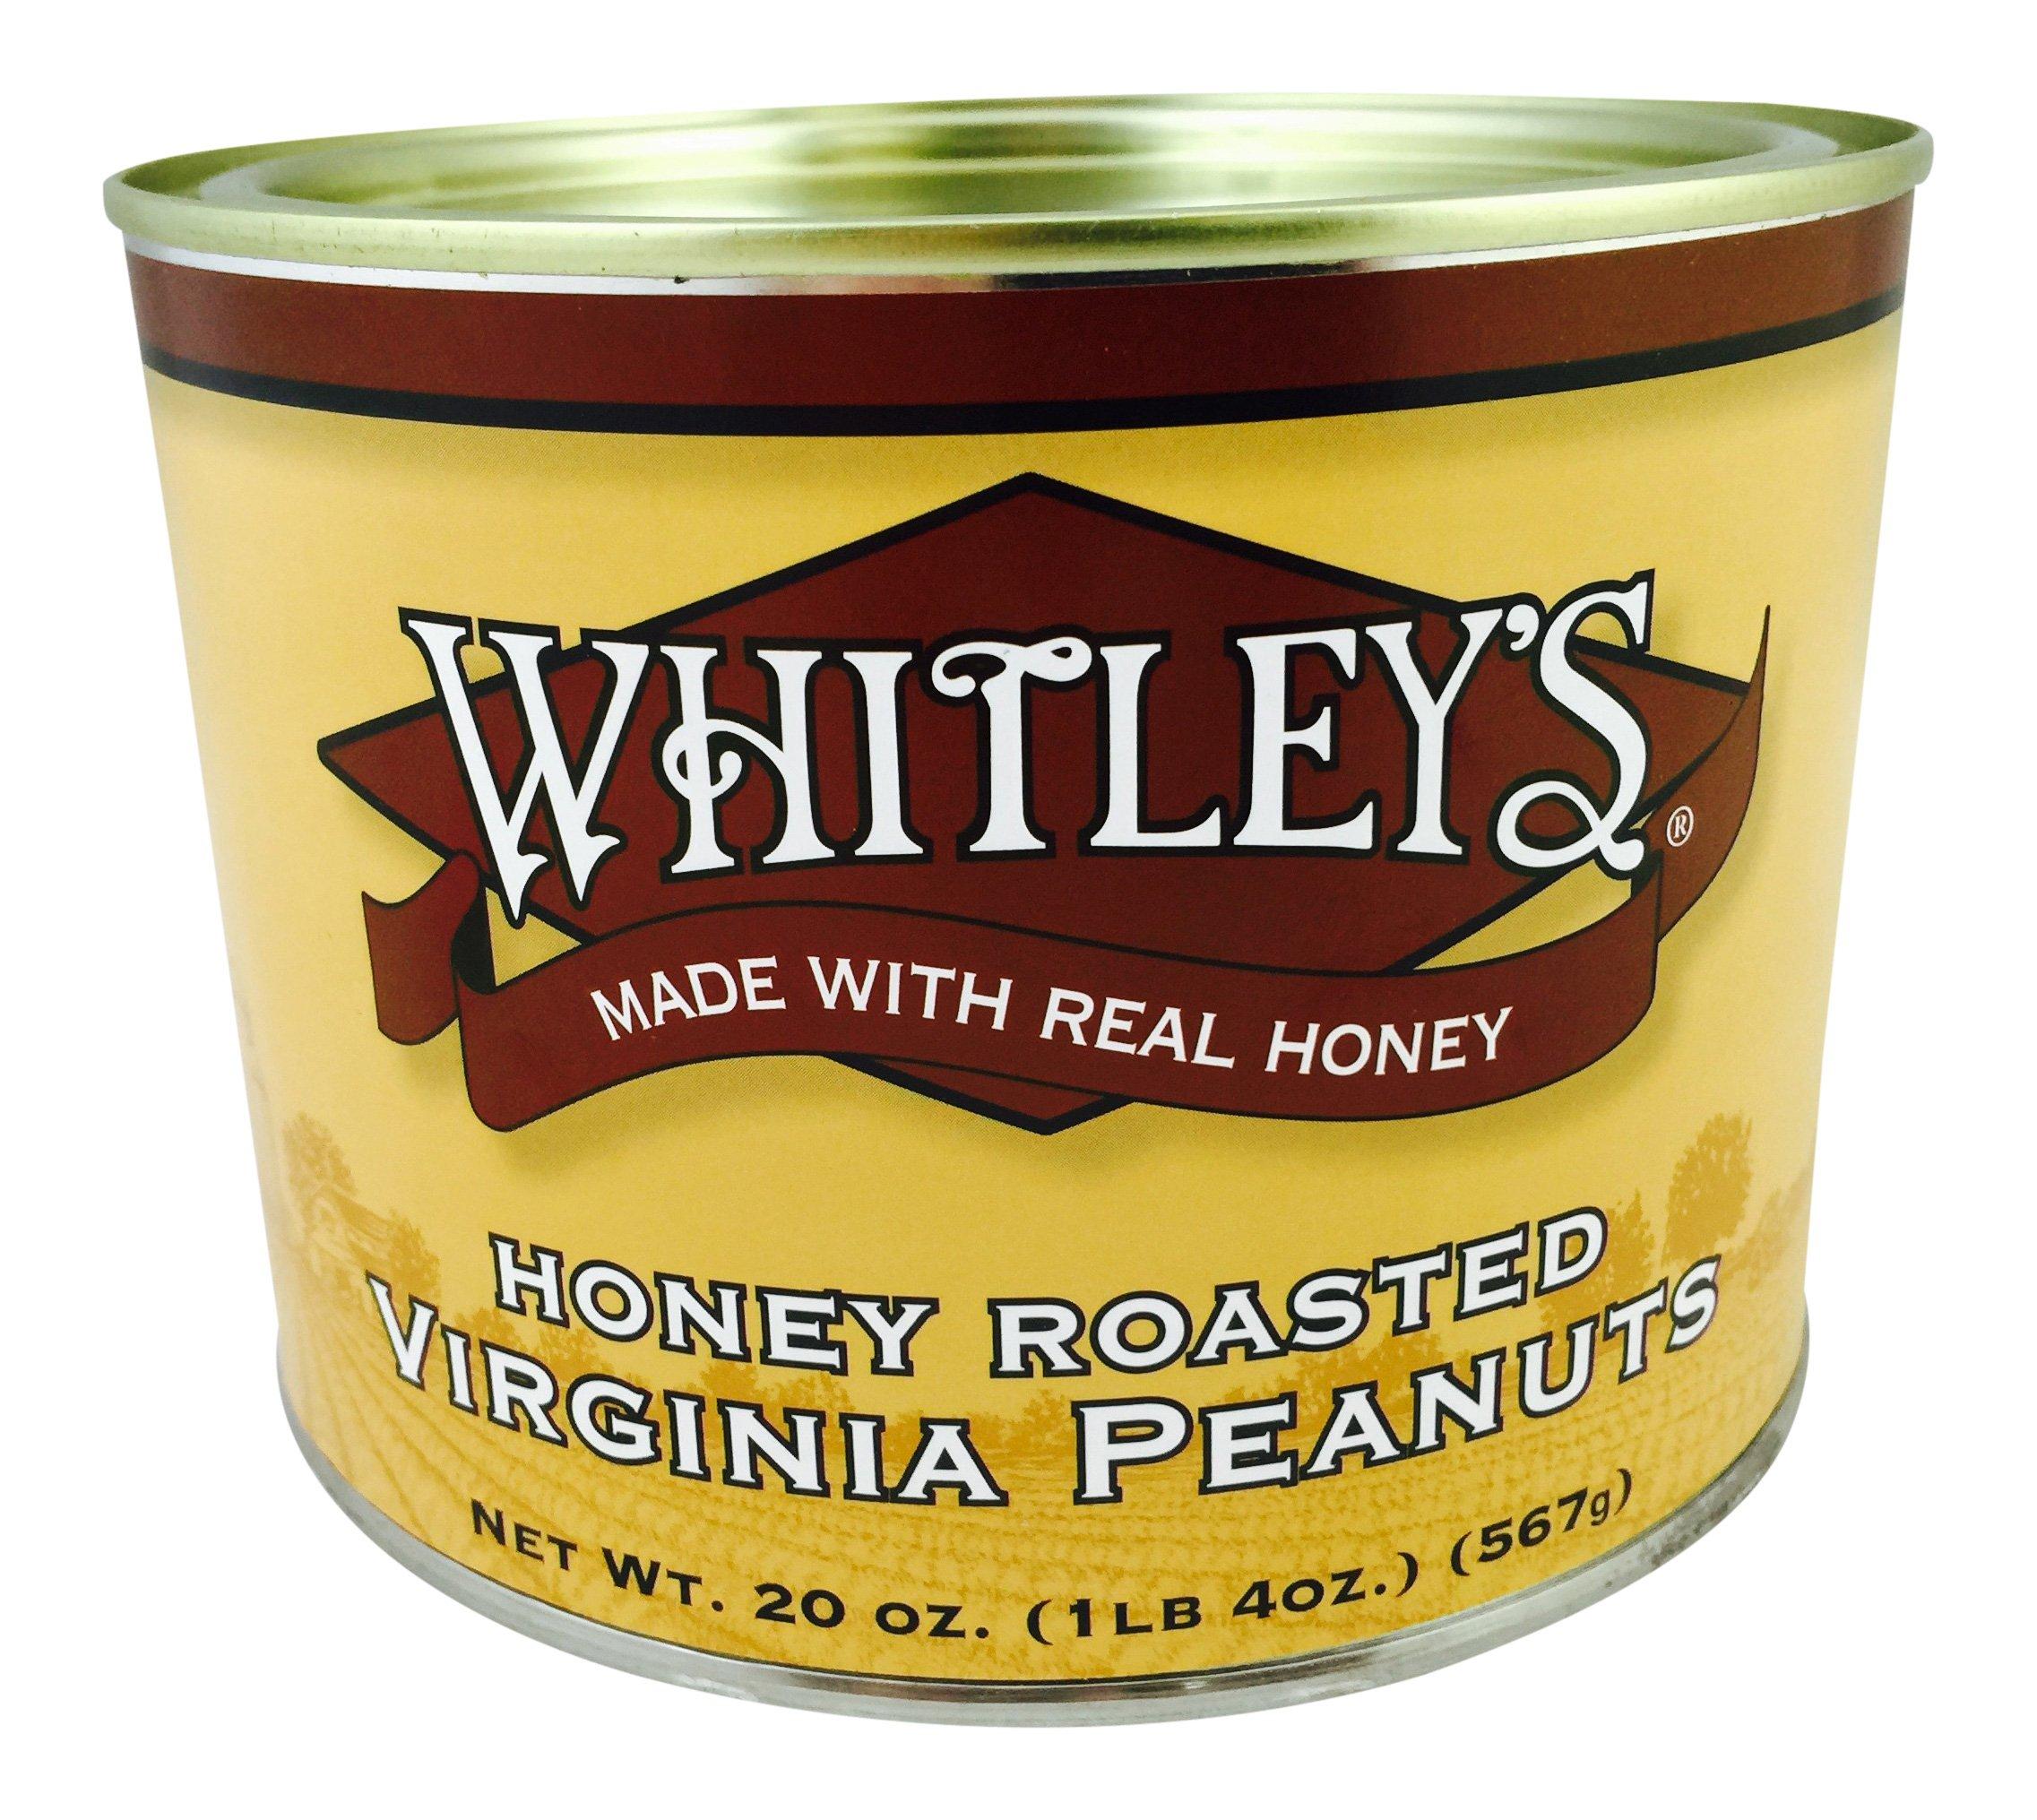 Whitleys Salt Pepper Virginia Peanuts Amazon Grocery